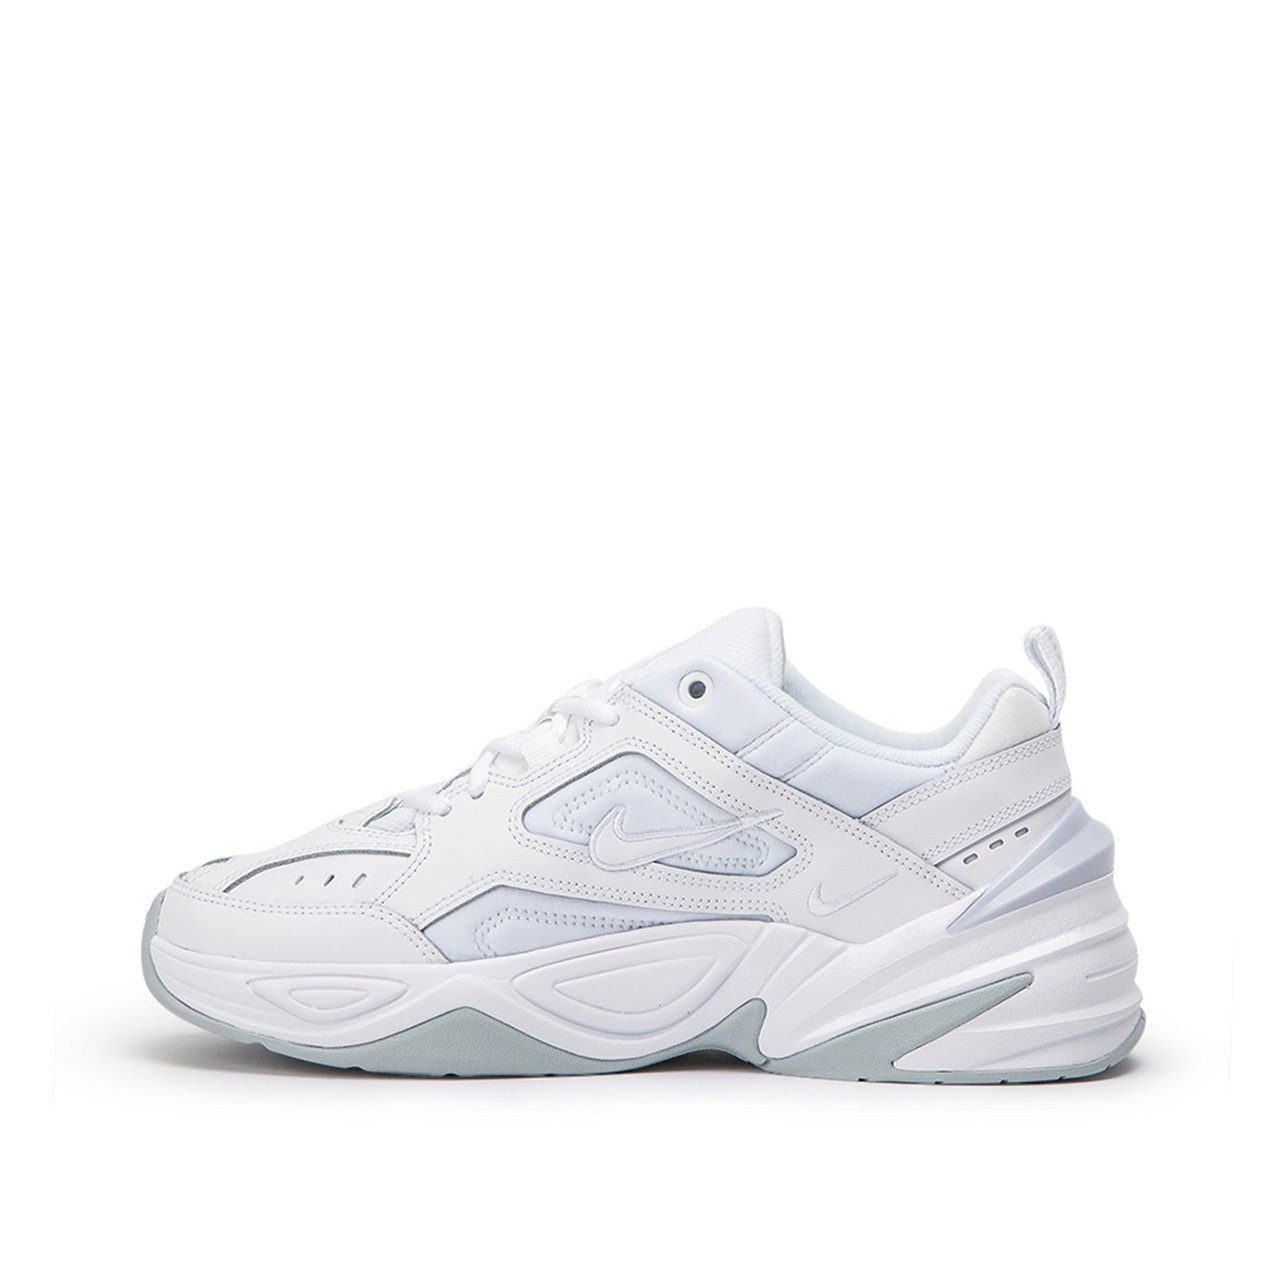 Кроссовки мужские Nike Air Monarch M2K Tekno White Platinum Белые